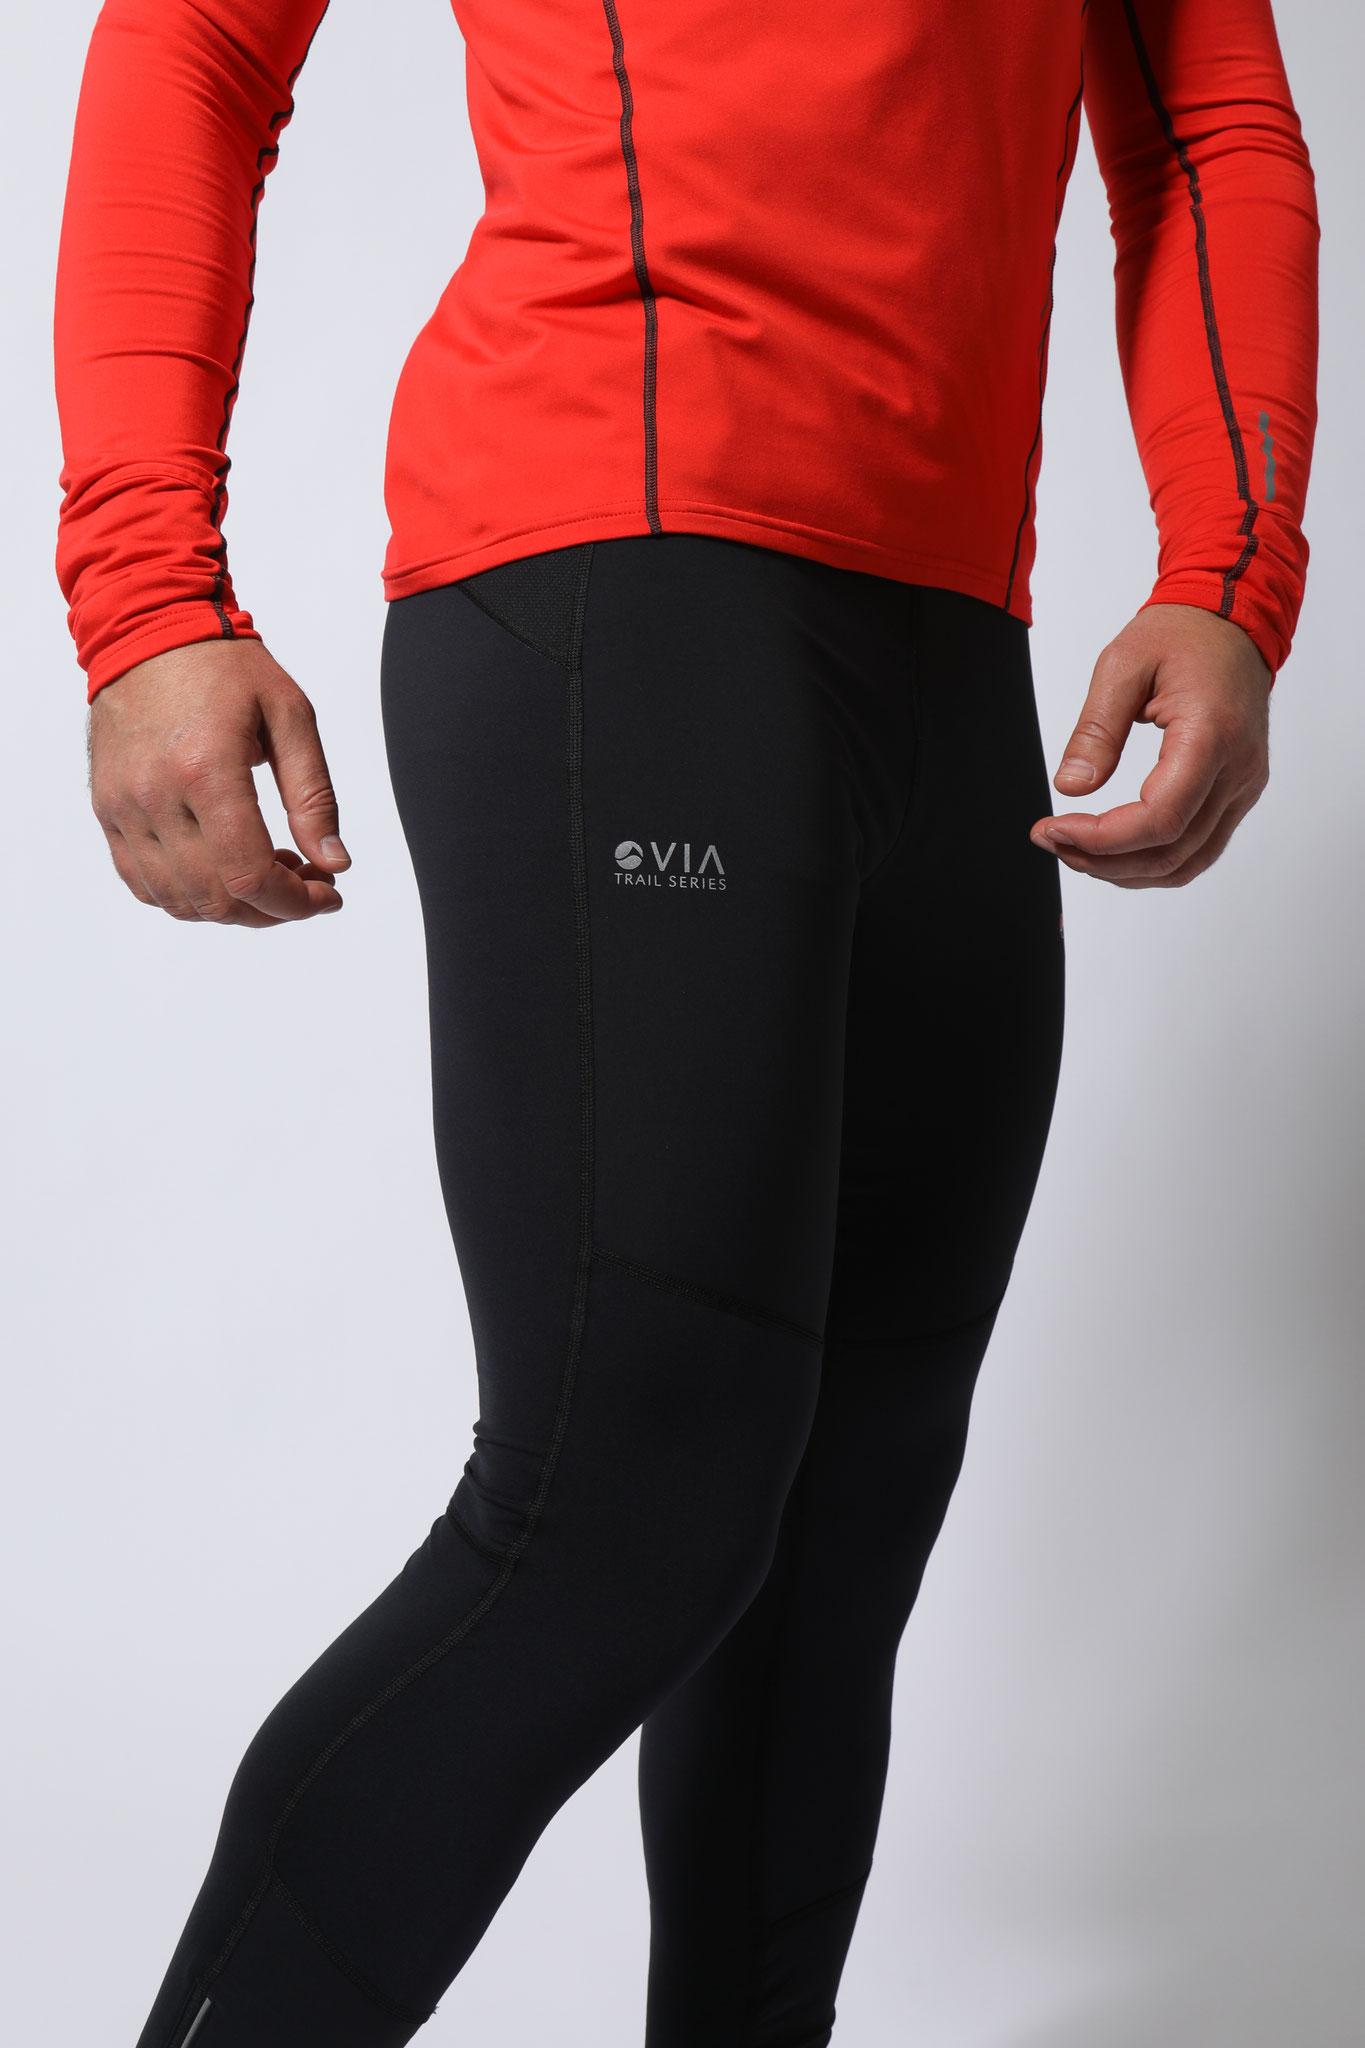 Men's Trail Series Thermal Tight